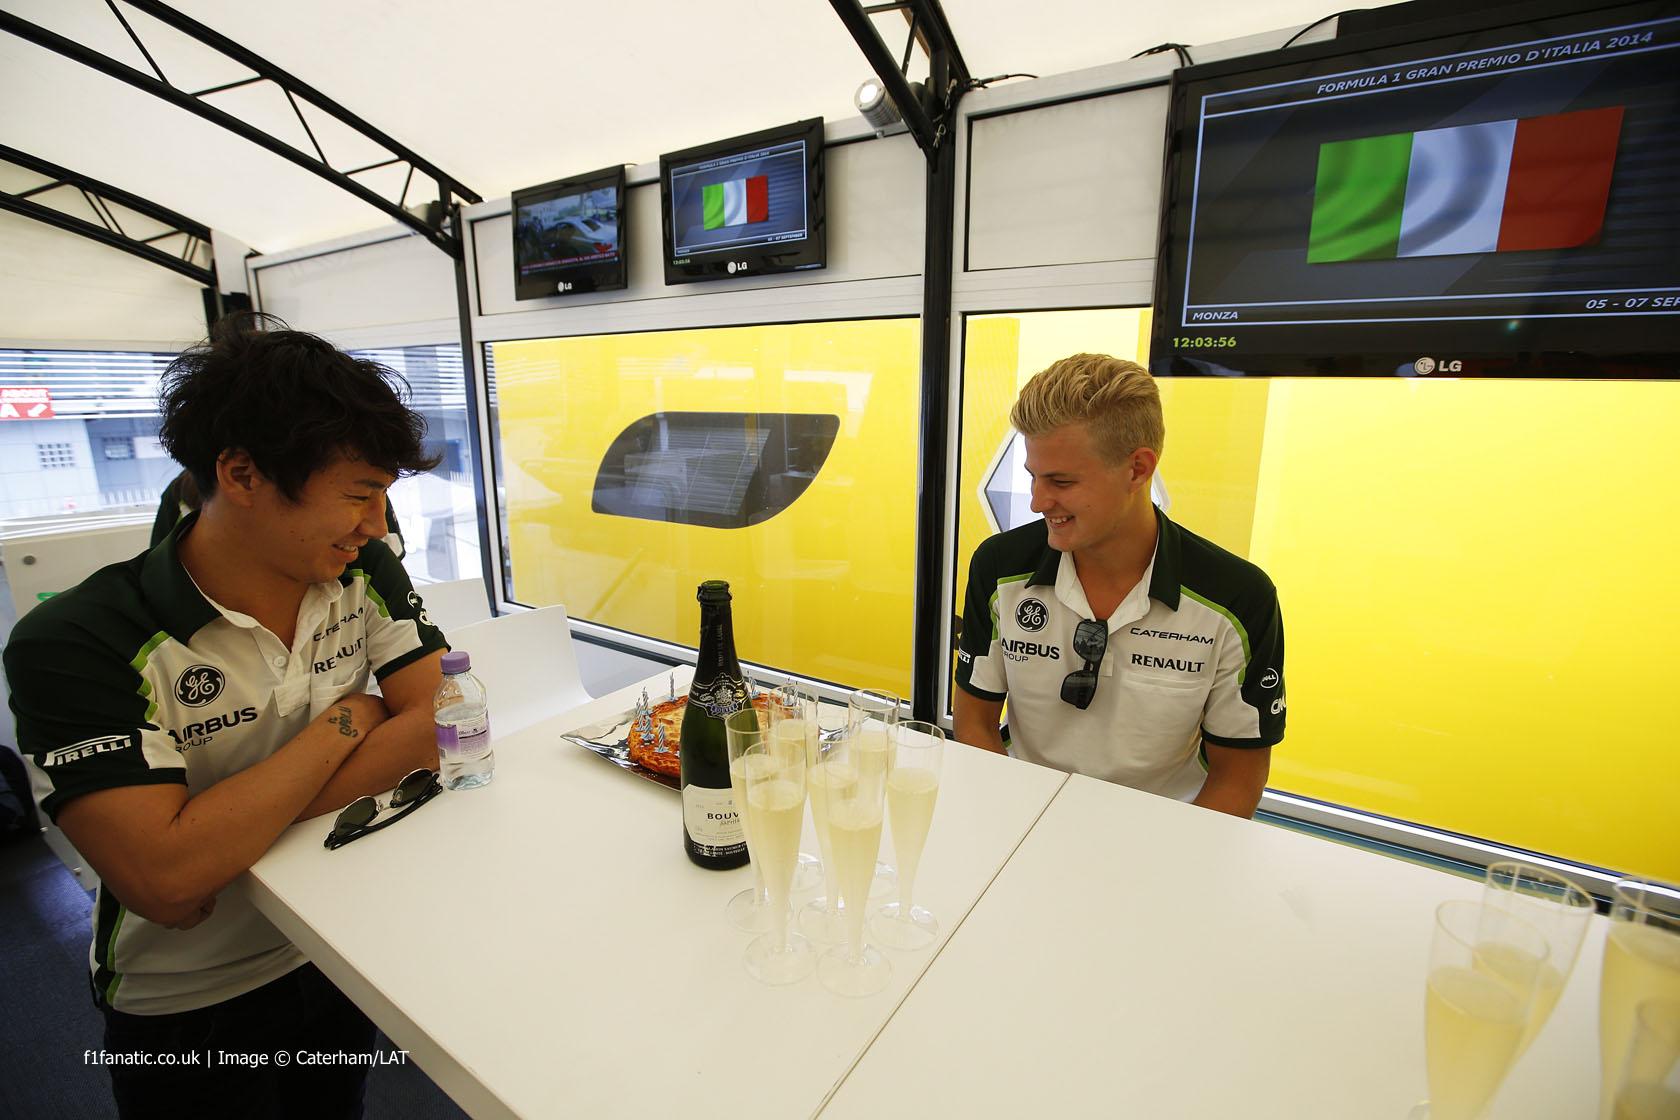 Kamui Kobayashi, Marcus Ericsson, Caterham, Monza, 2014